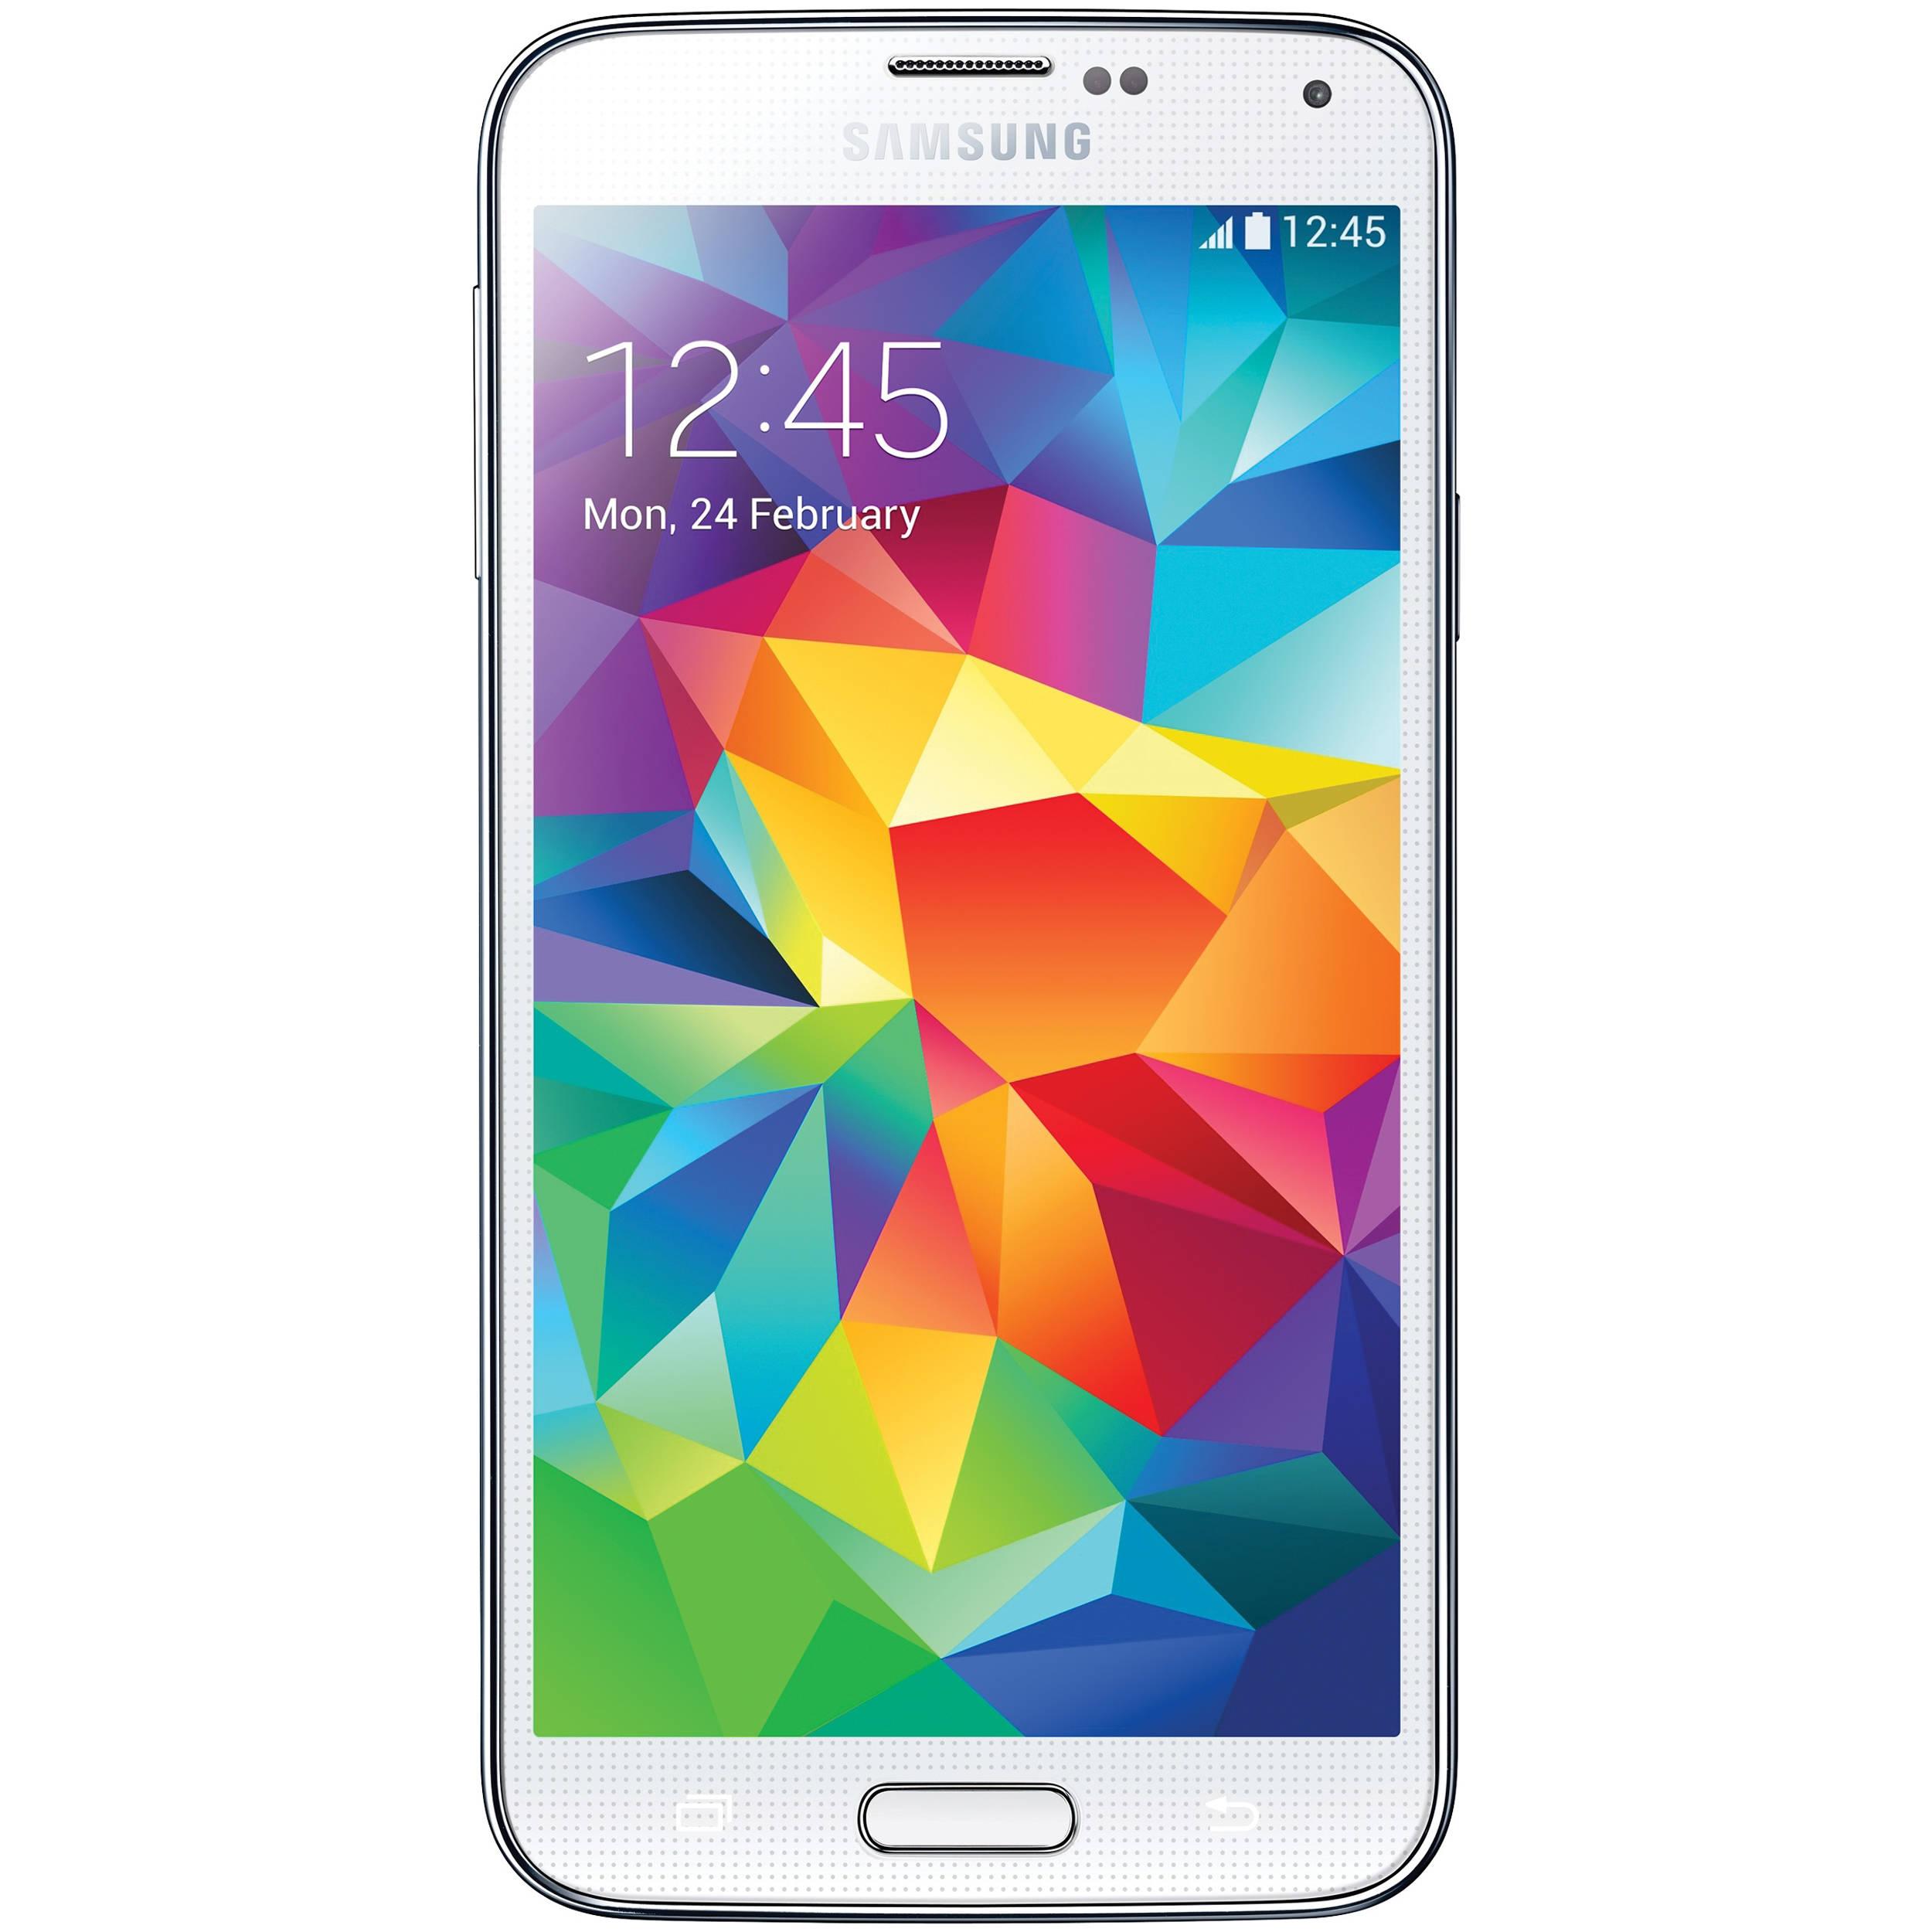 samsung galaxy s5 sm g900f 16gb smartphone sm g900f white b h. Black Bedroom Furniture Sets. Home Design Ideas